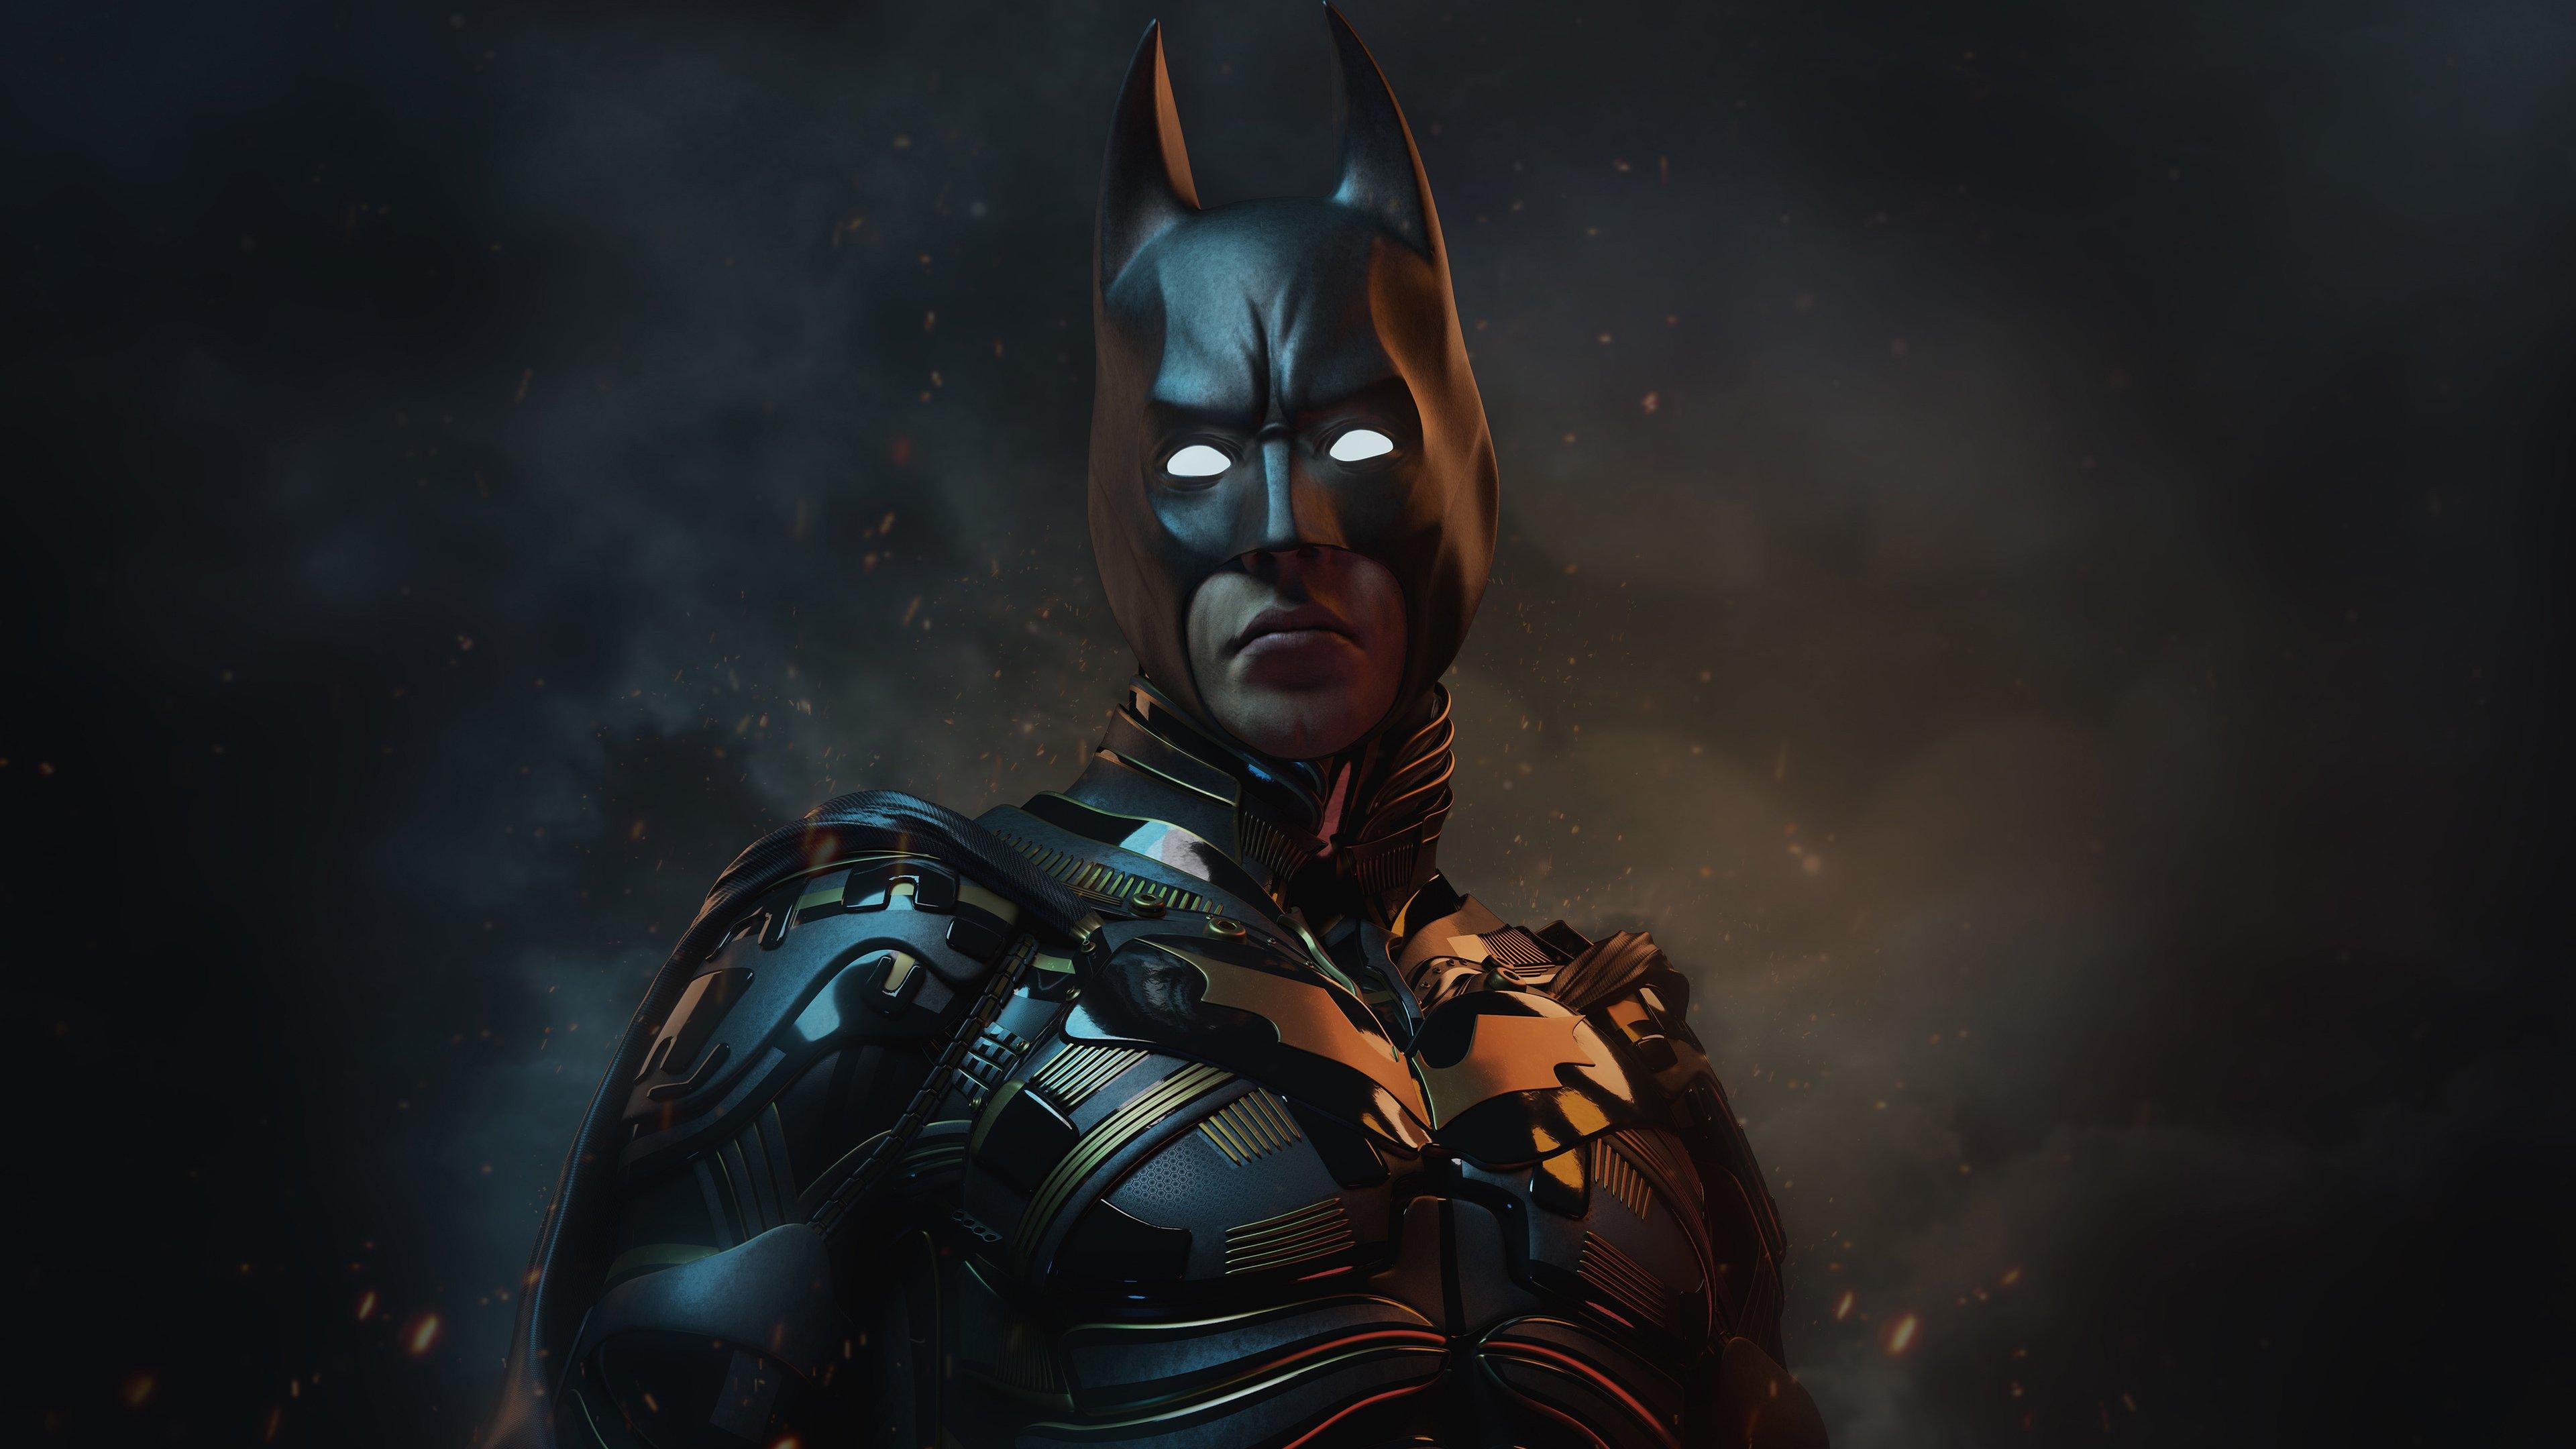 Fondos de pantalla Christian Bale as Batman